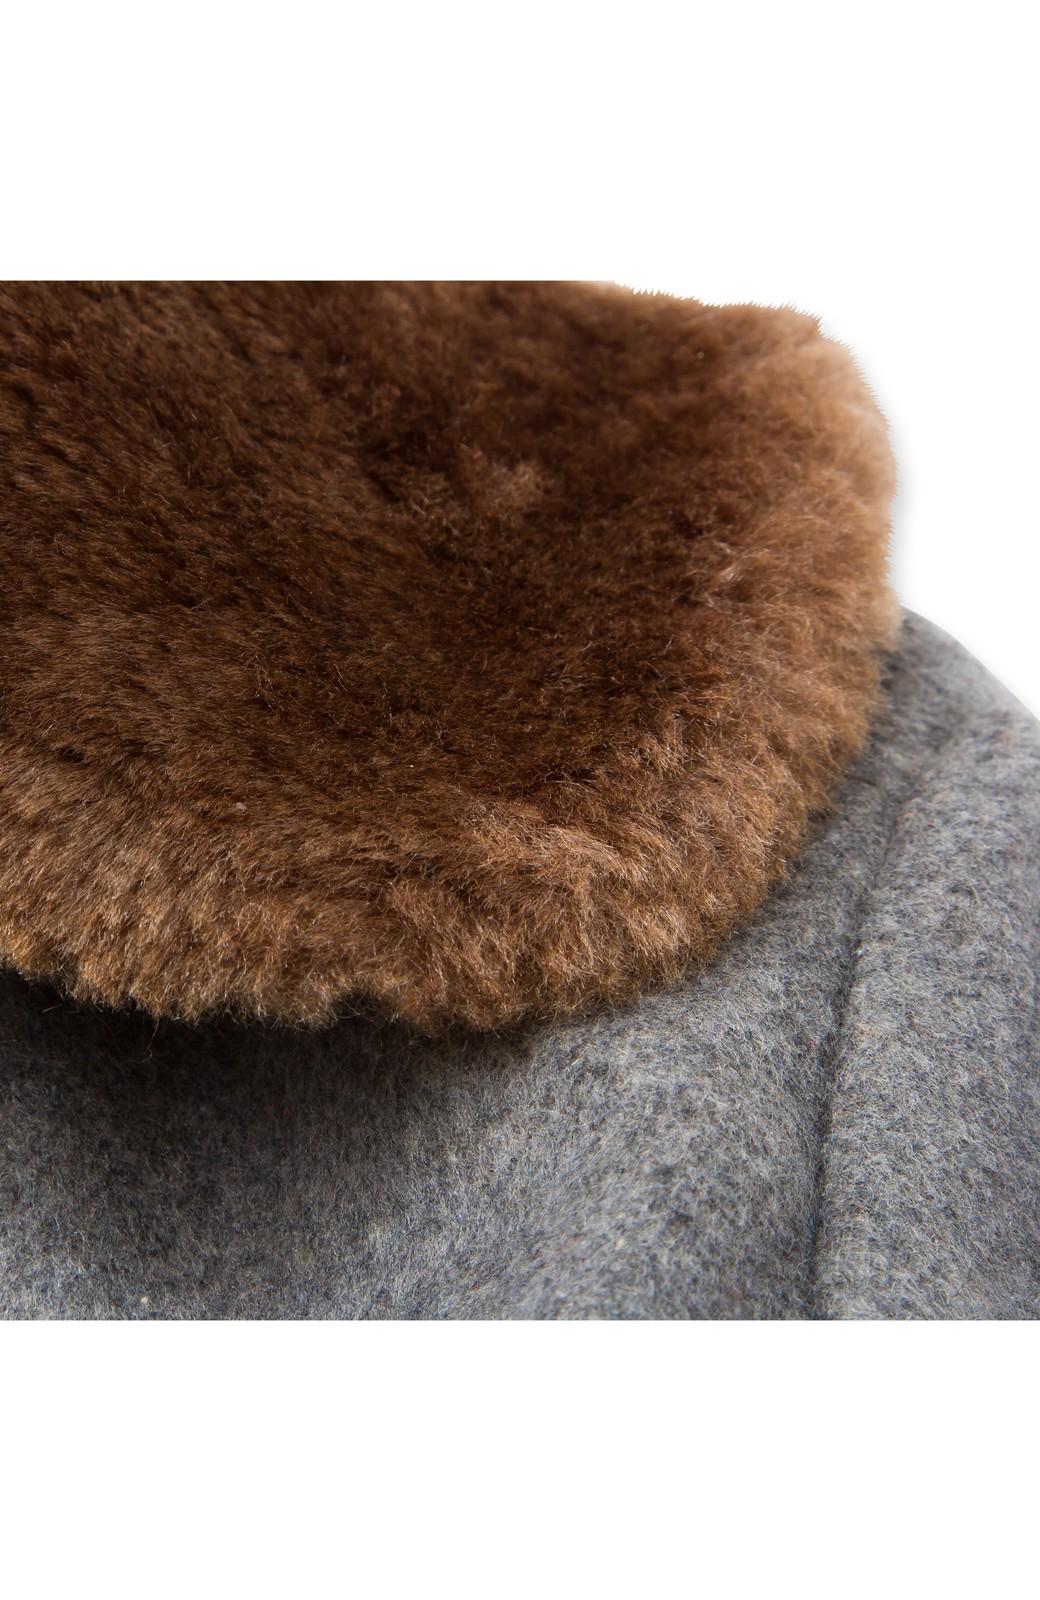 pilvee 取り外しフェイクファー衿付き ウール混のノーカラーコート <グレー>の商品写真4